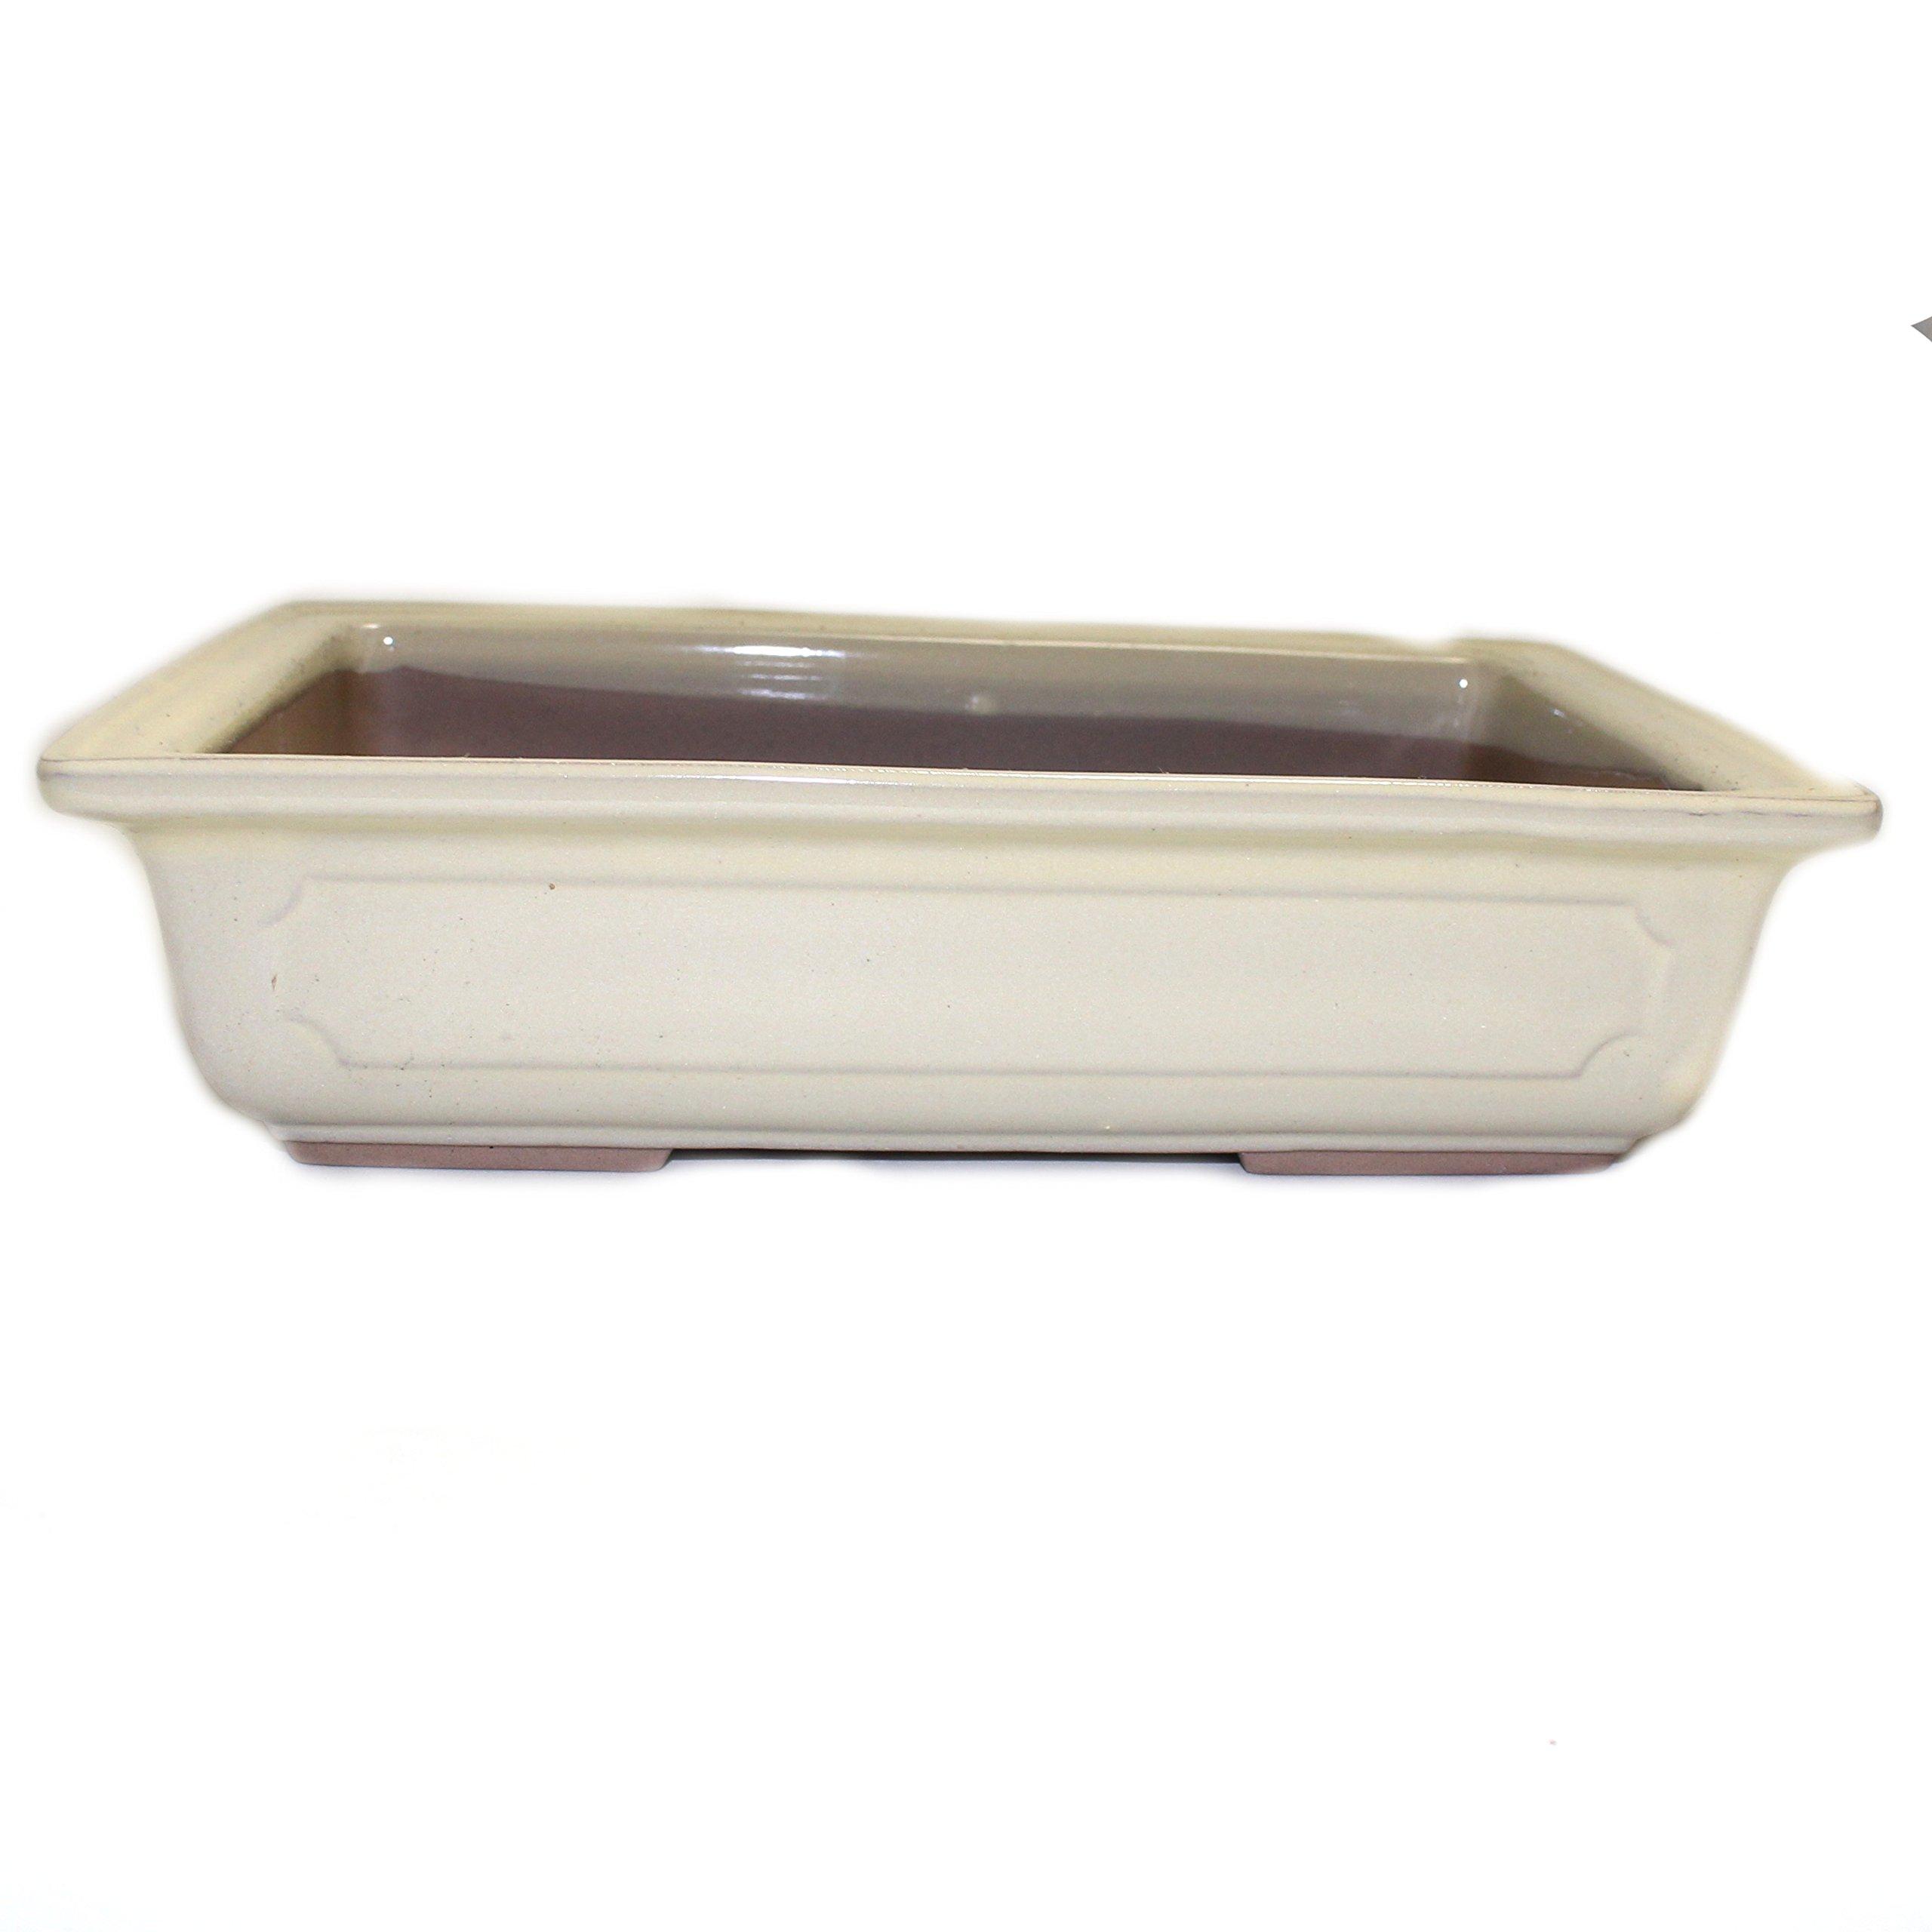 Bonsai Pot Ceramic Rectangle Window Shaped Decorations (9'', Cream-Yu)